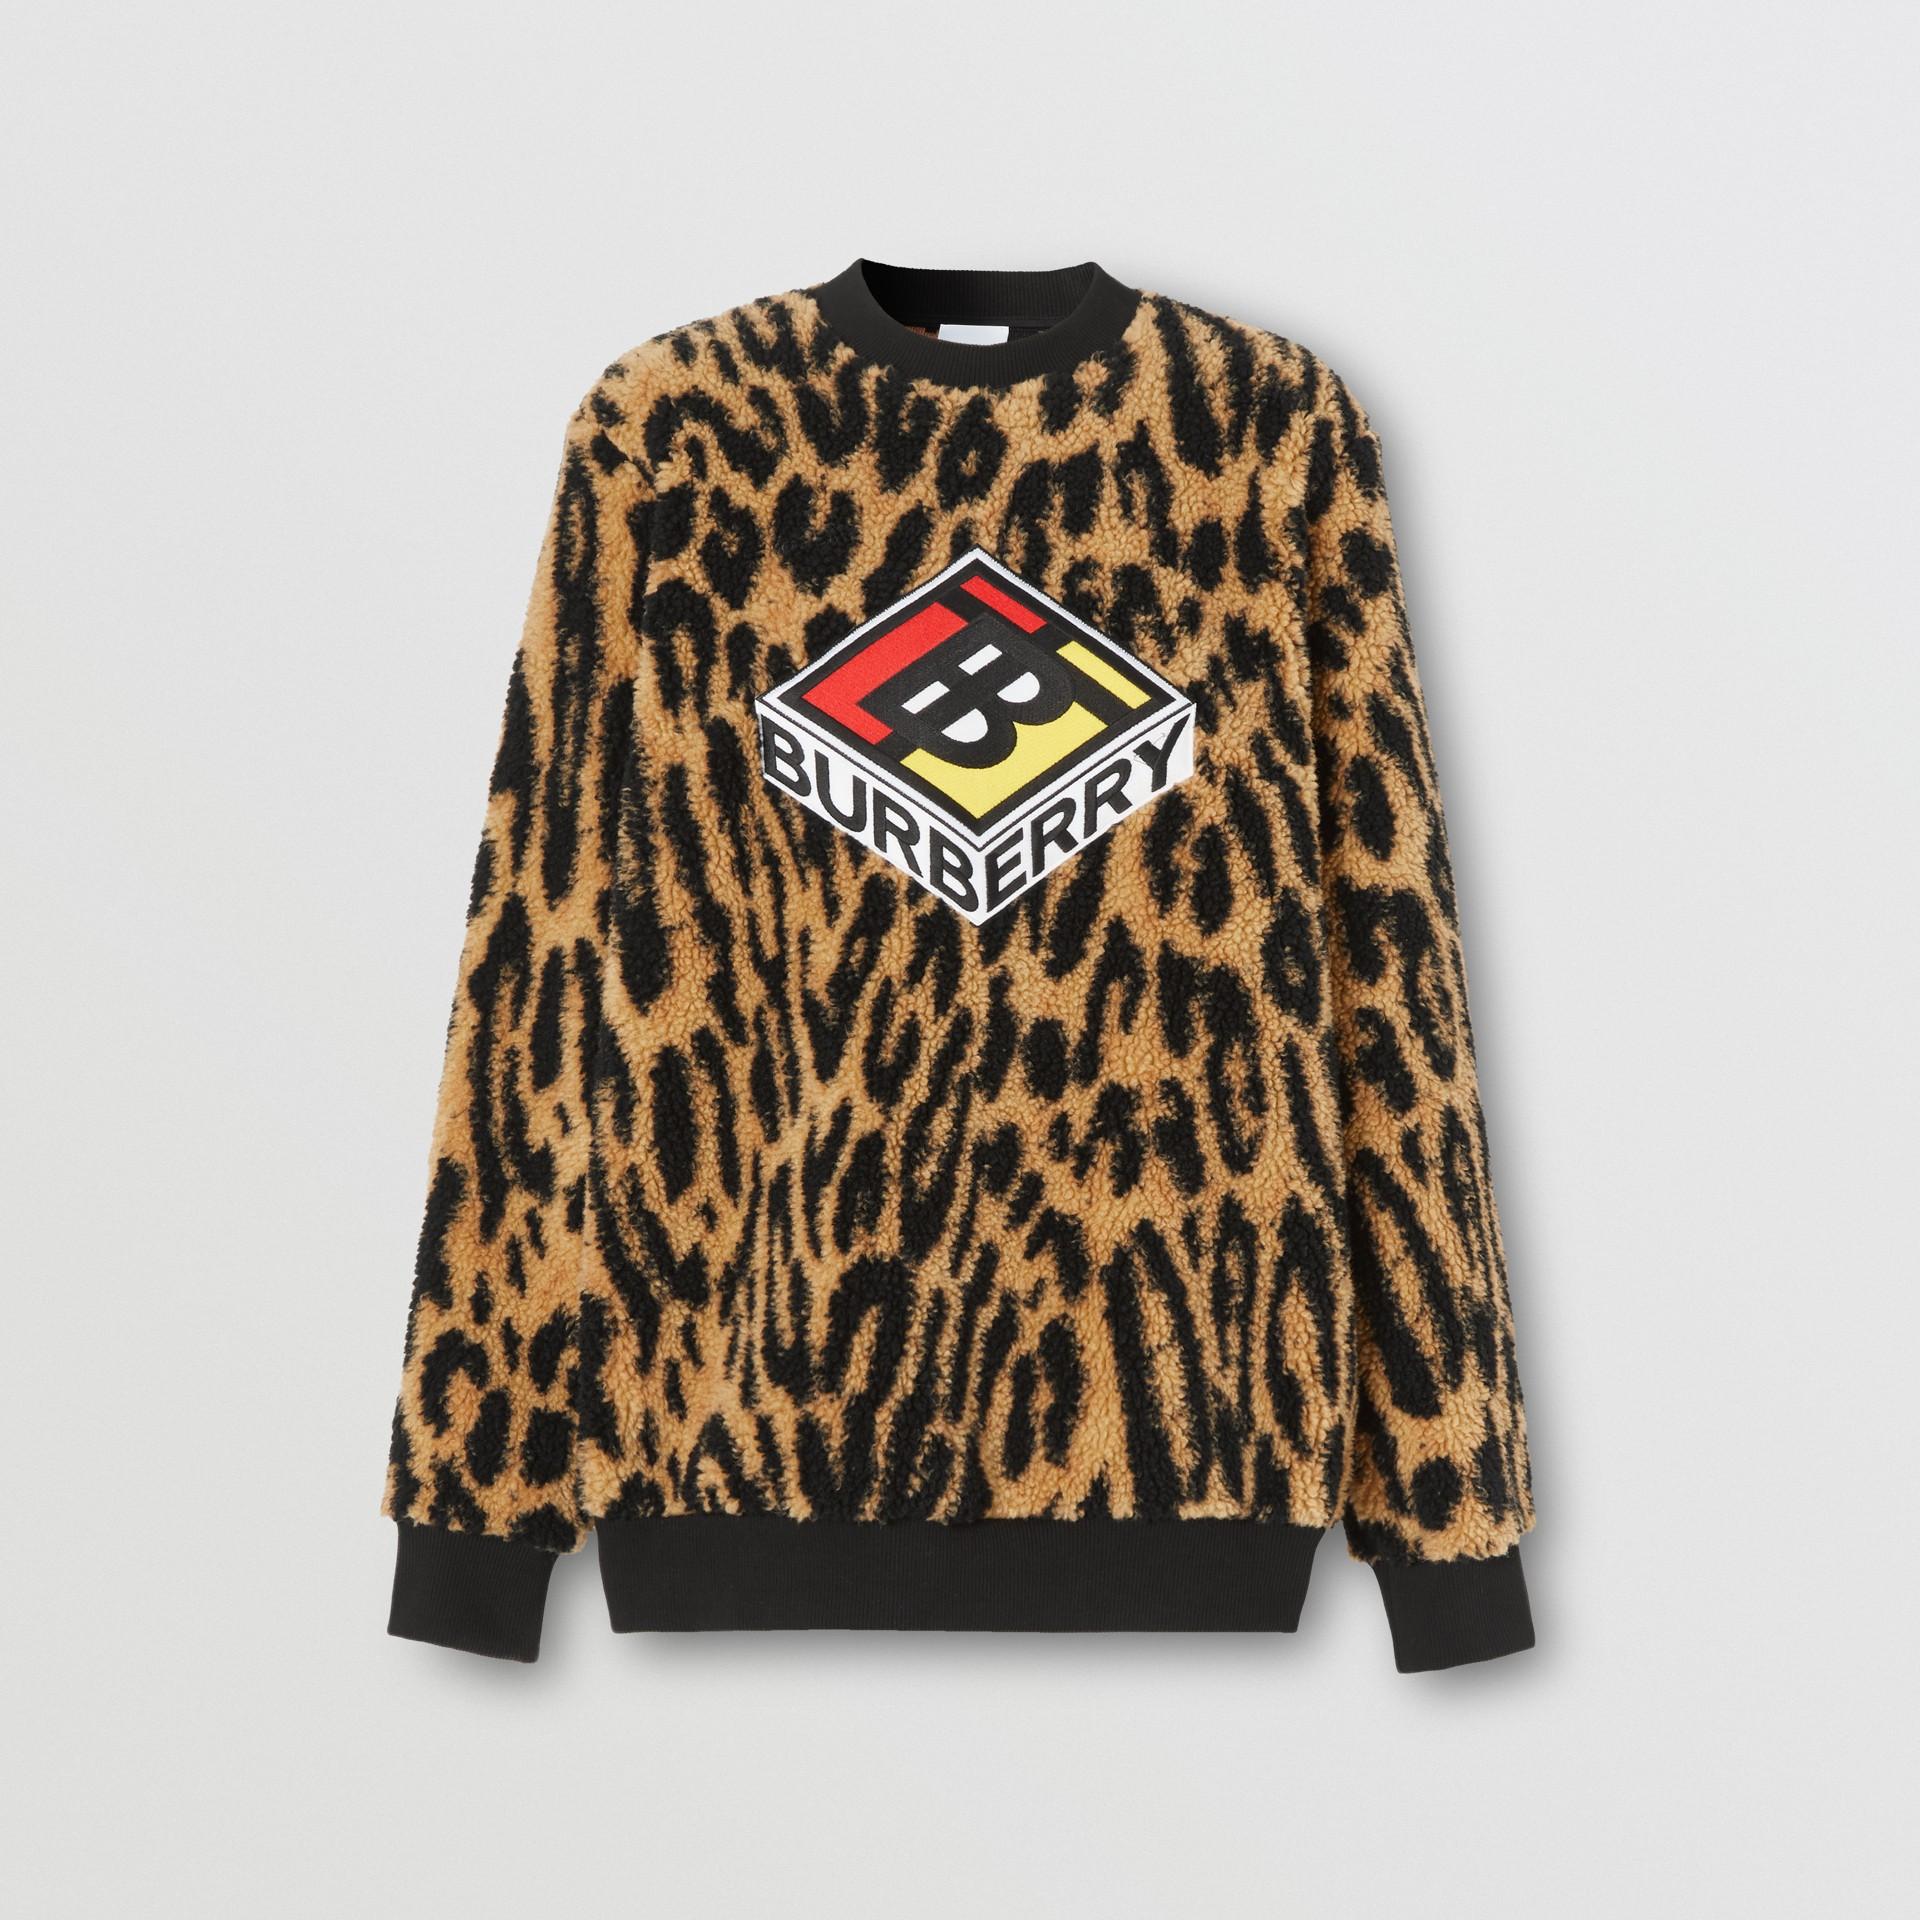 Logo Graphic Leopard Fleece Jacquard Sweatshirt in Dark Mustard - Women | Burberry - gallery image 3